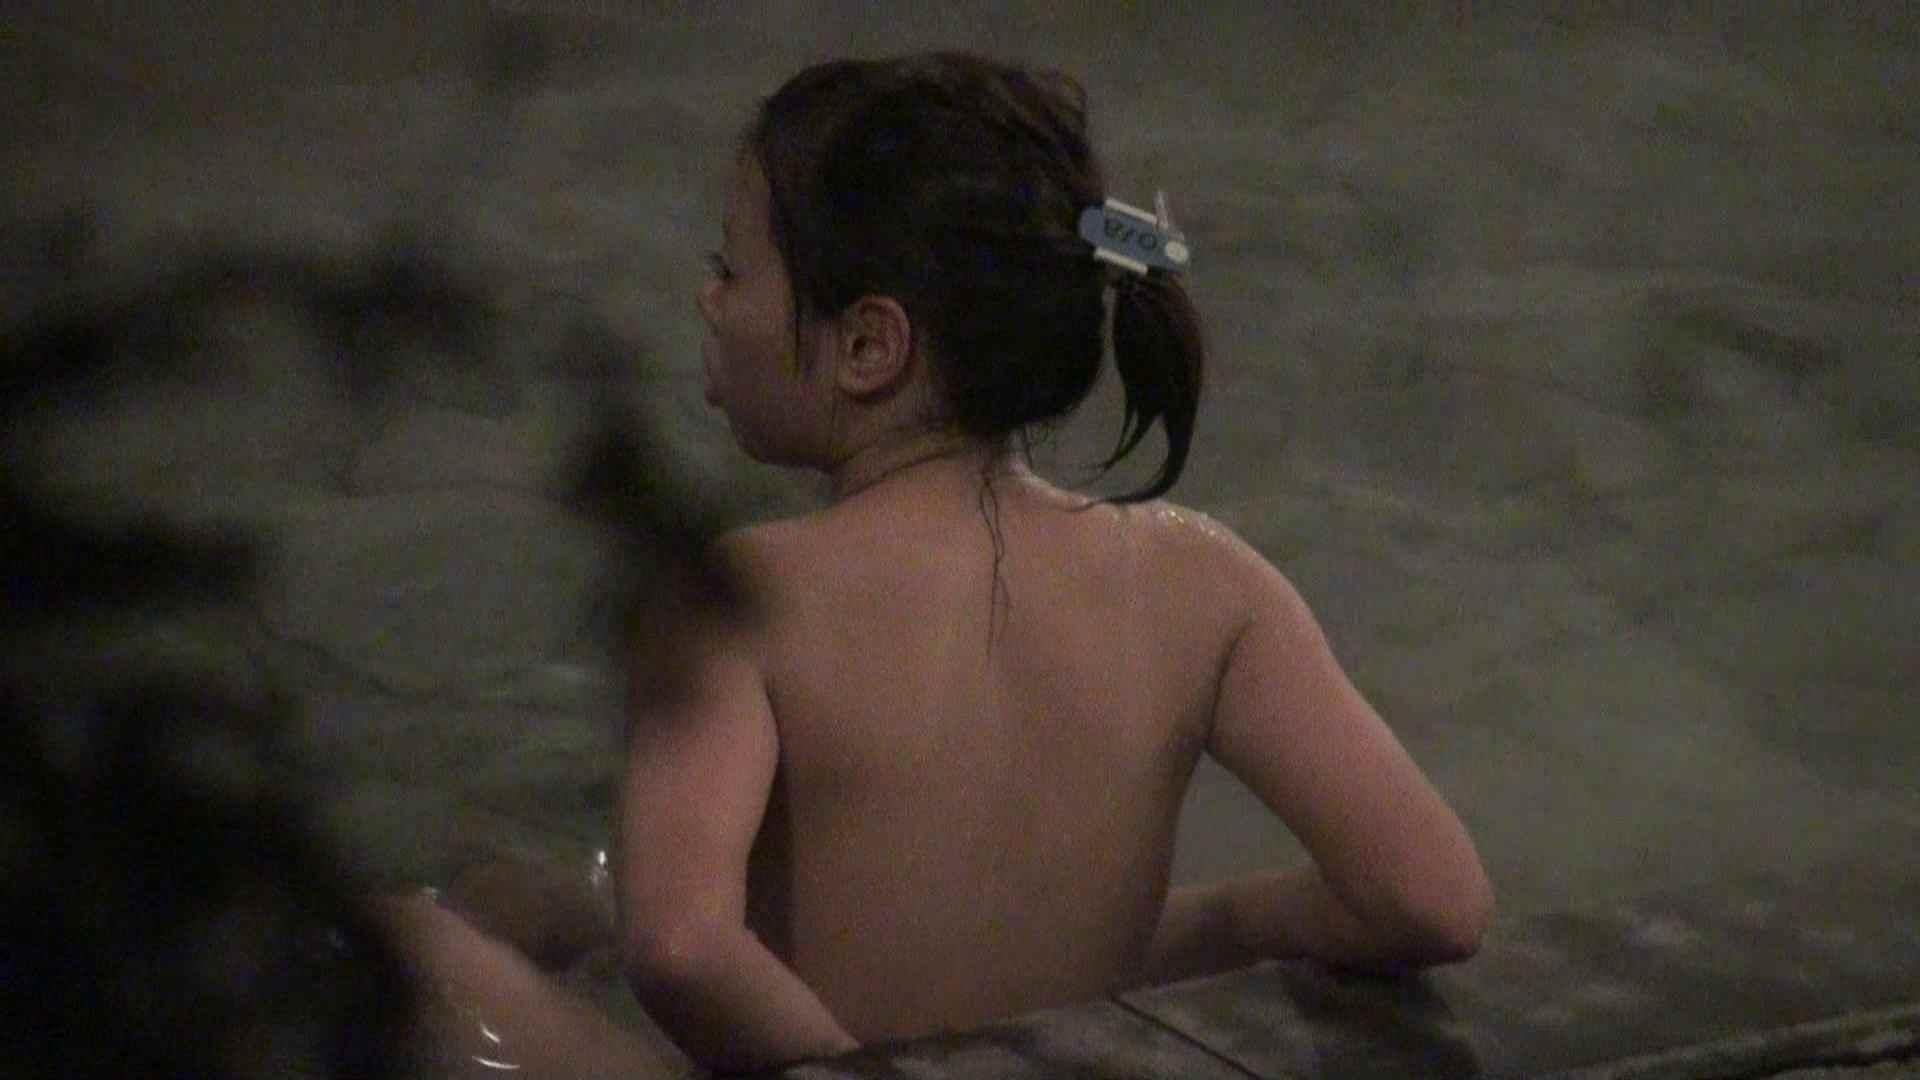 Aquaな露天風呂Vol.407 盗撮 ぱこり動画紹介 107画像 11